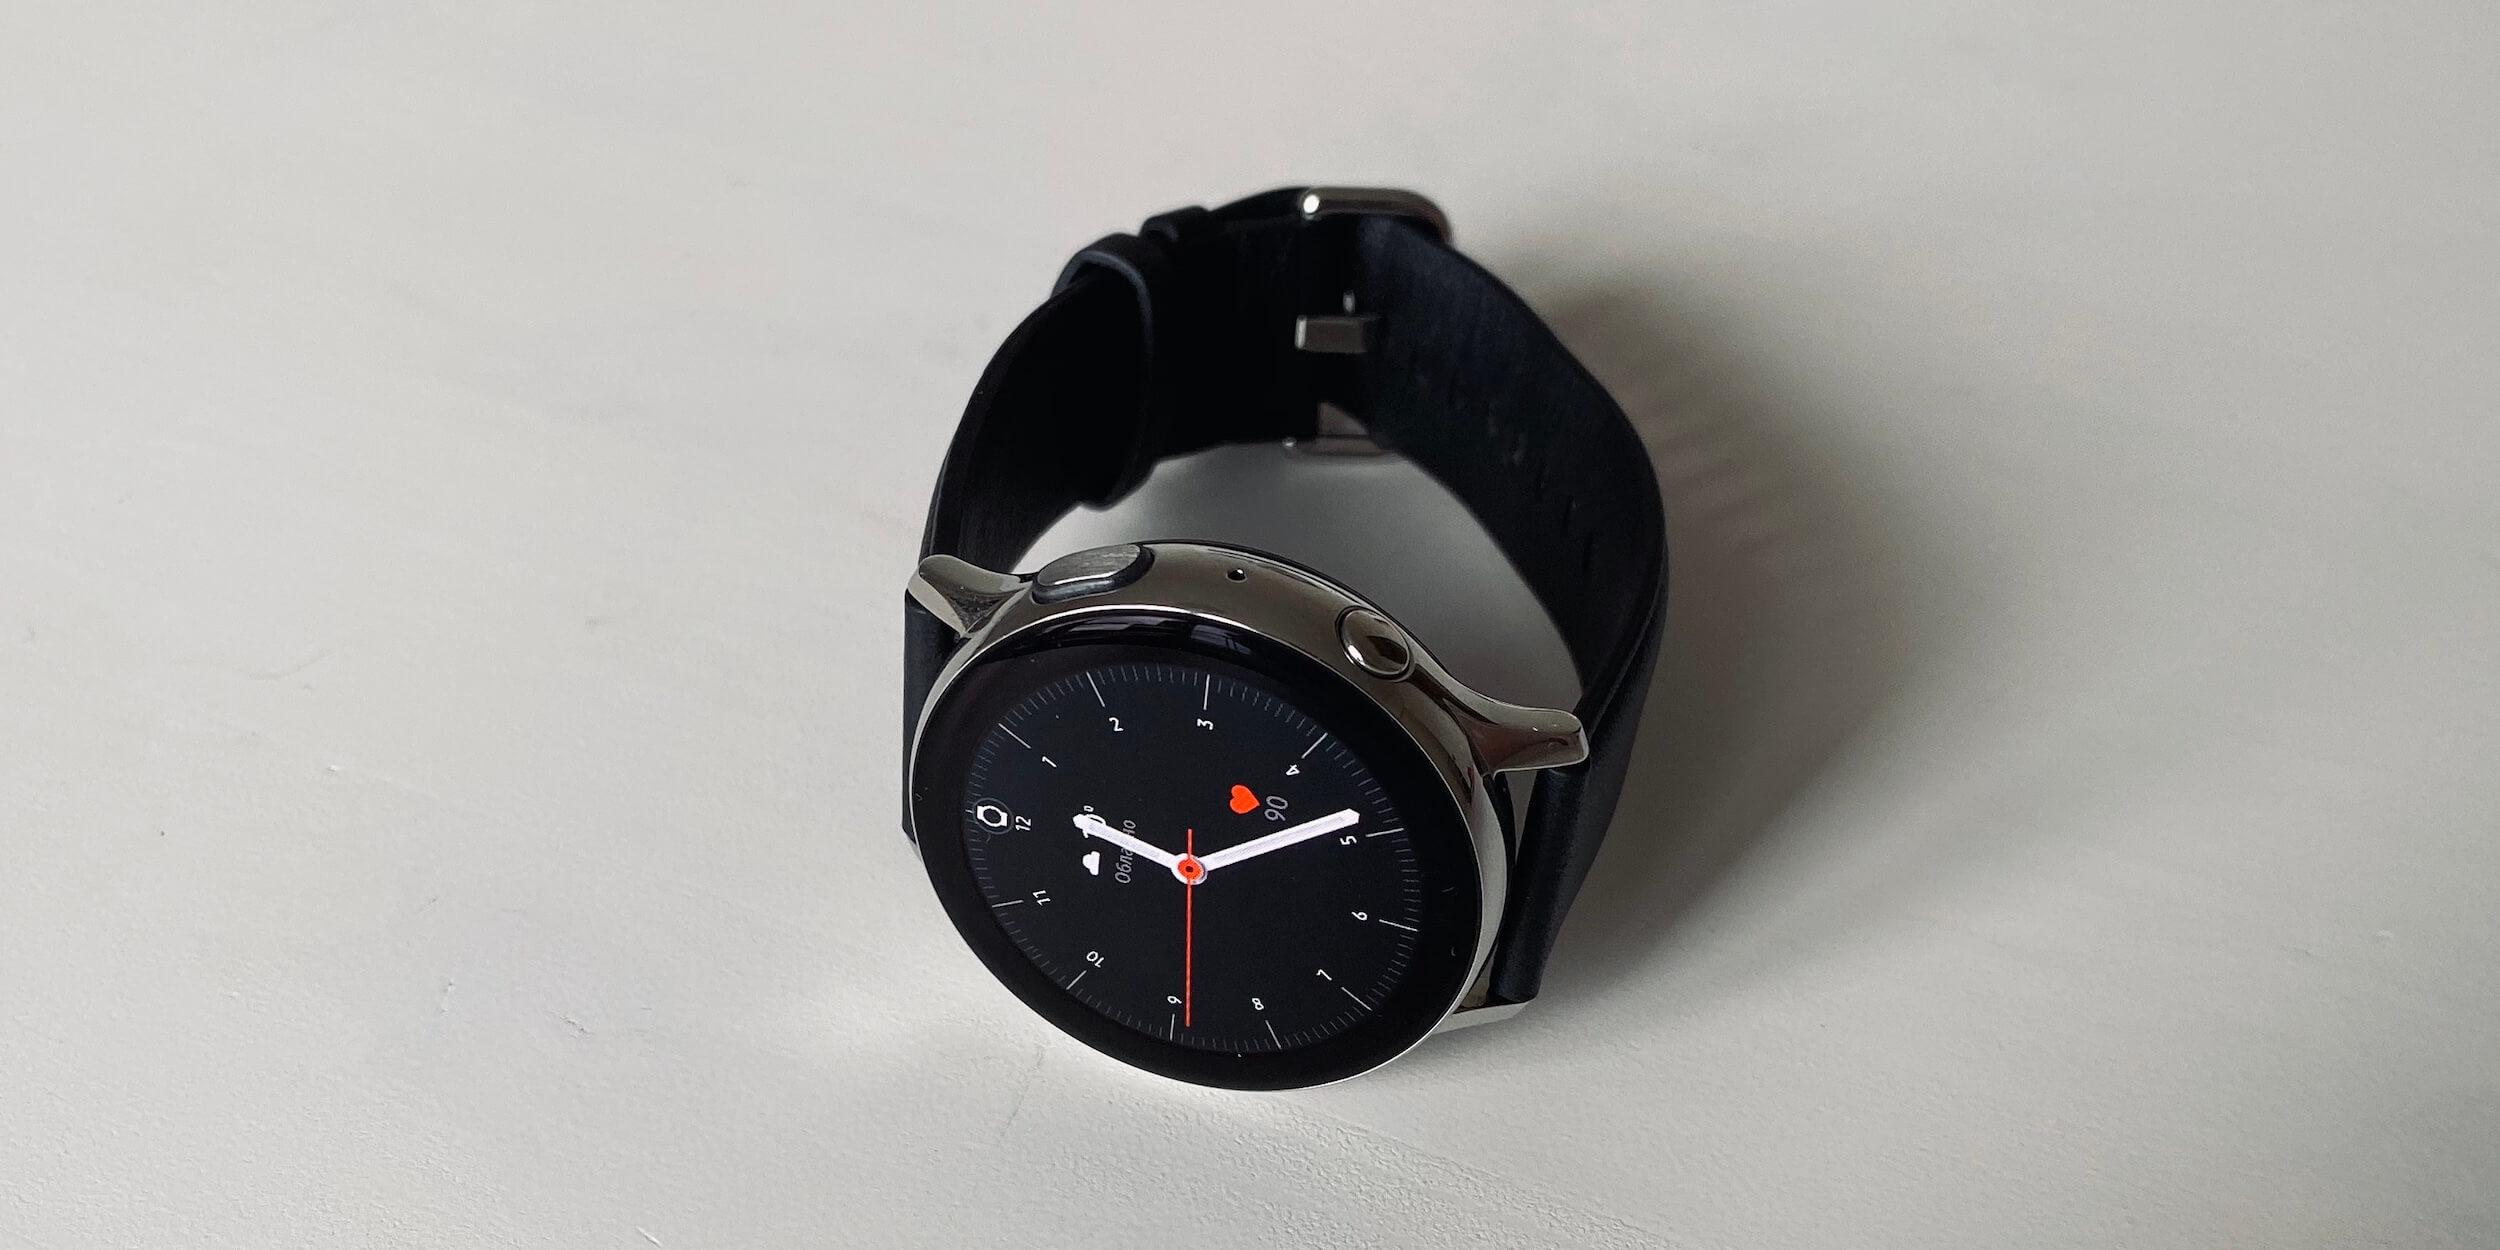 Samsung Galaxy Watch Active 2: стандартный циферблат